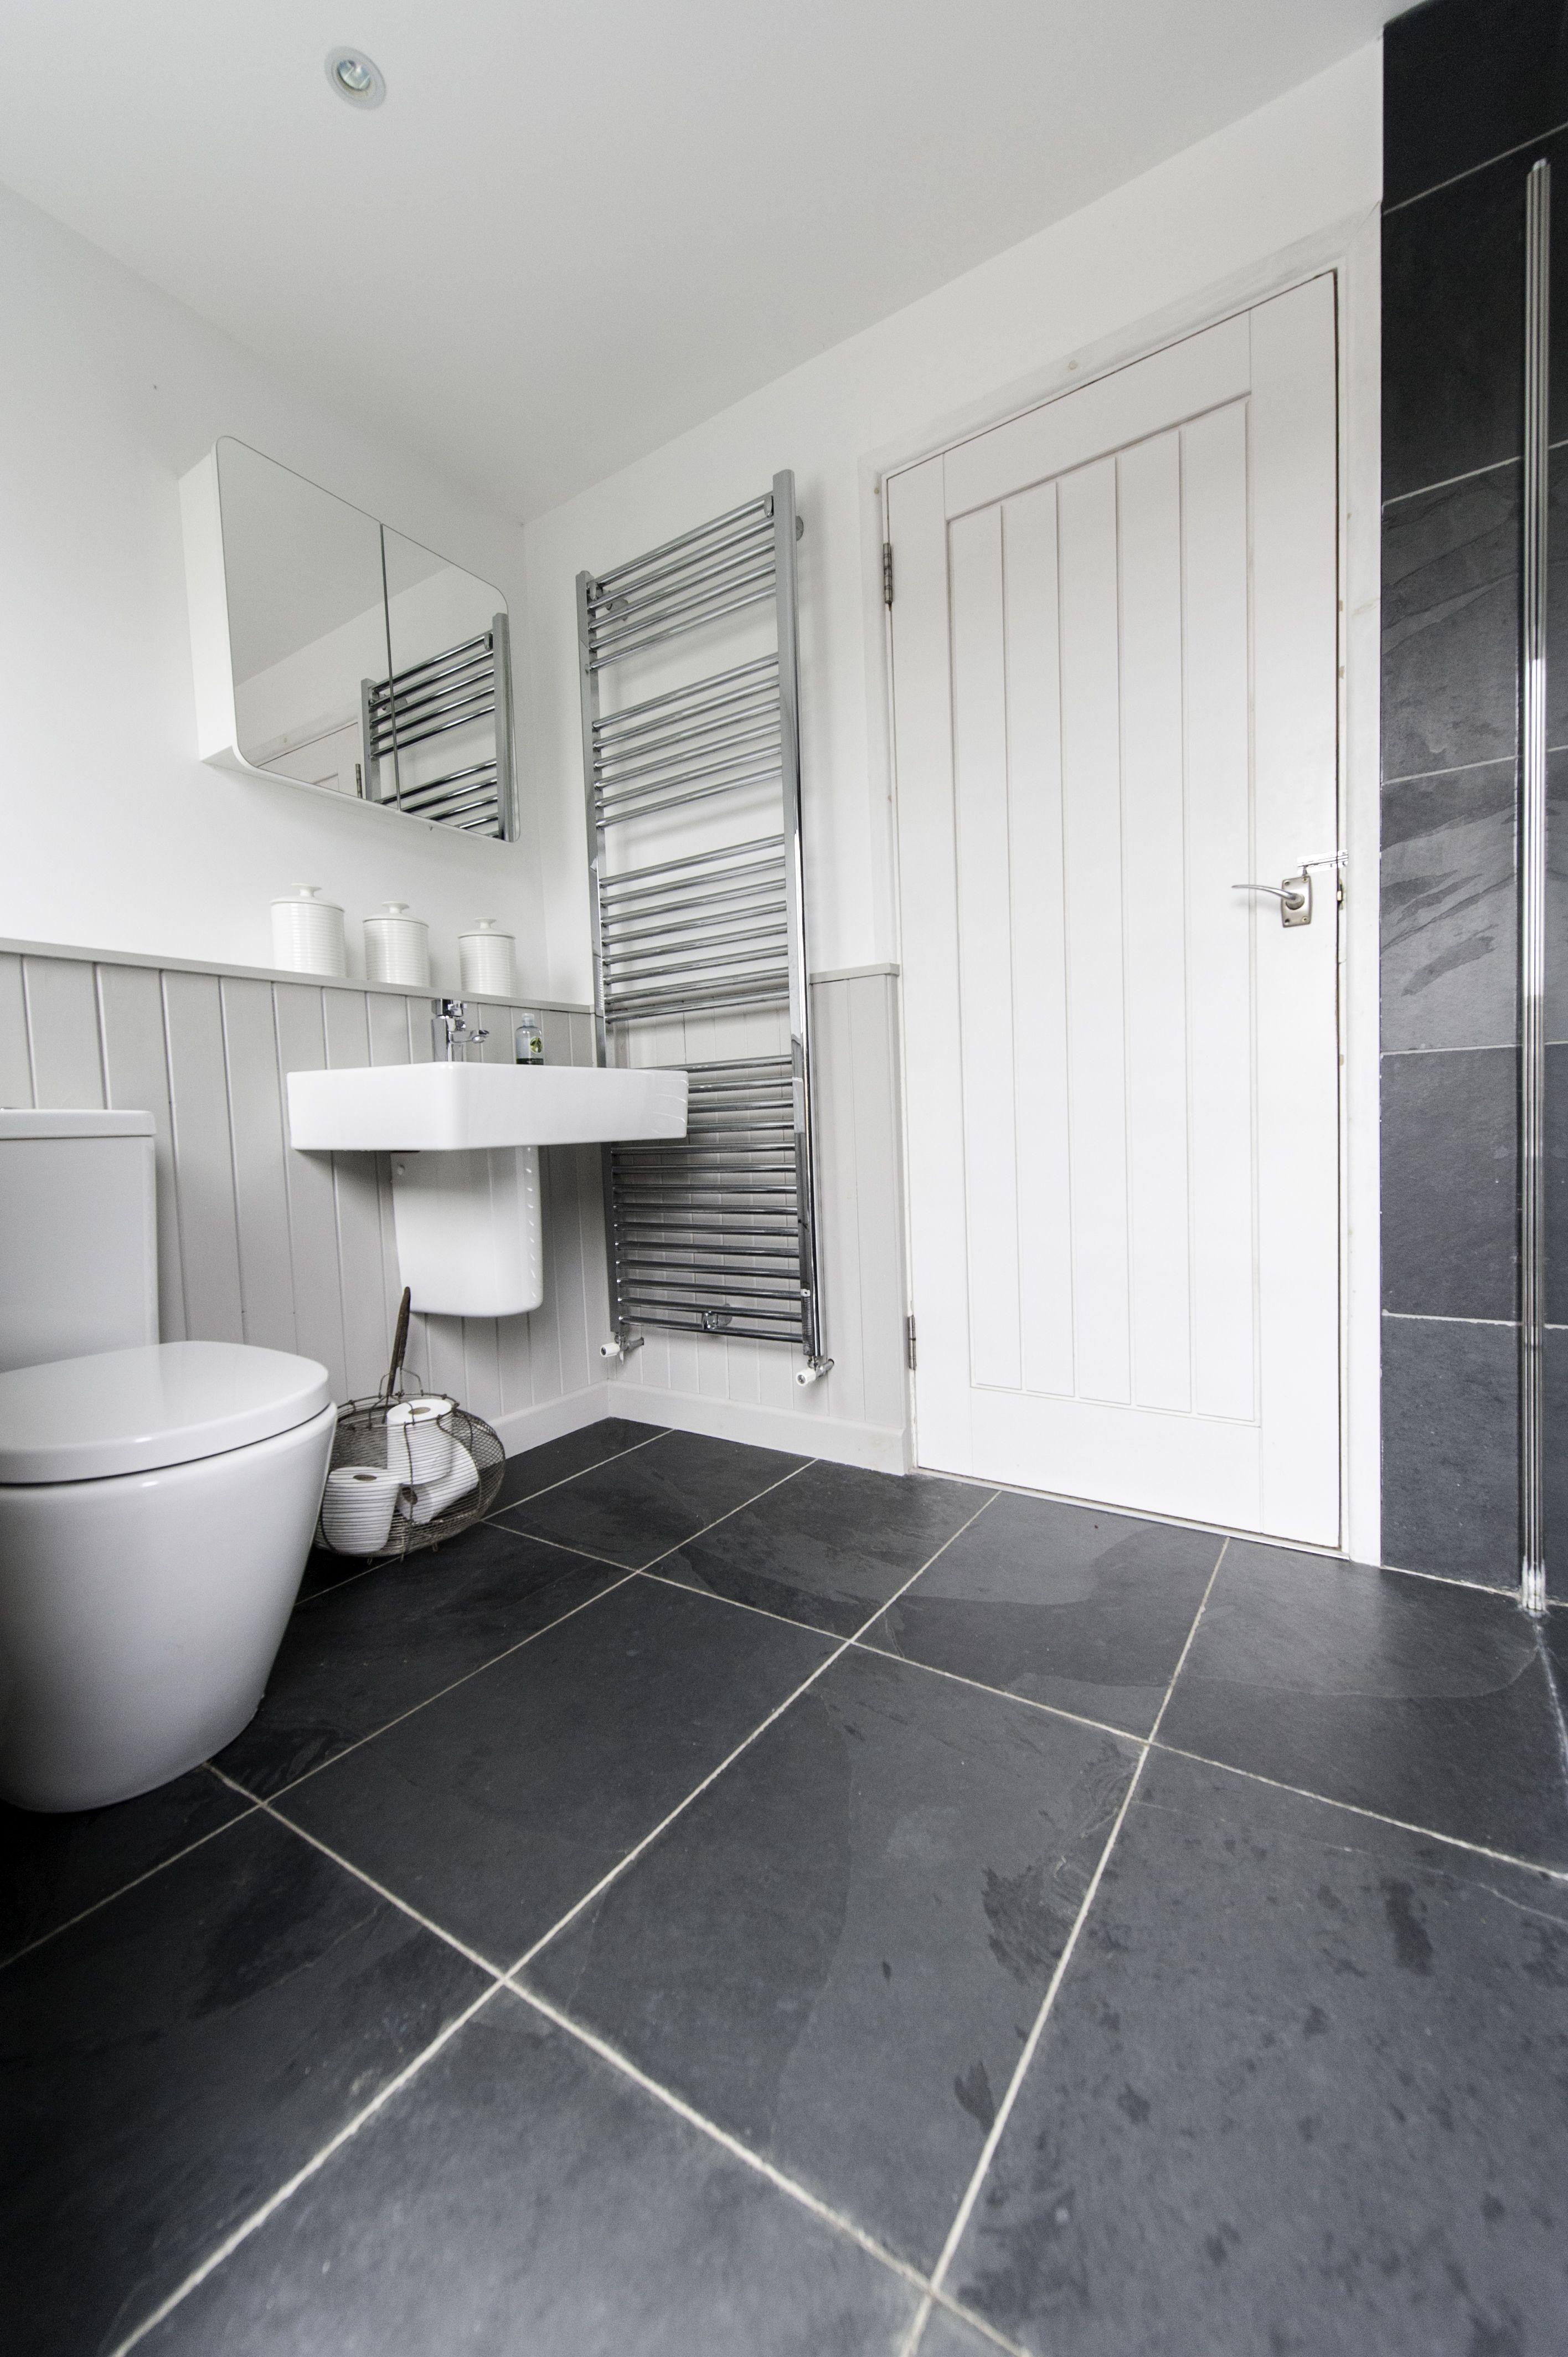 Slate Floor Tiles Bathroom Interior Design Flagstones Slate Bathroom Tile Slate Bathroom Floor Slate Bathroom